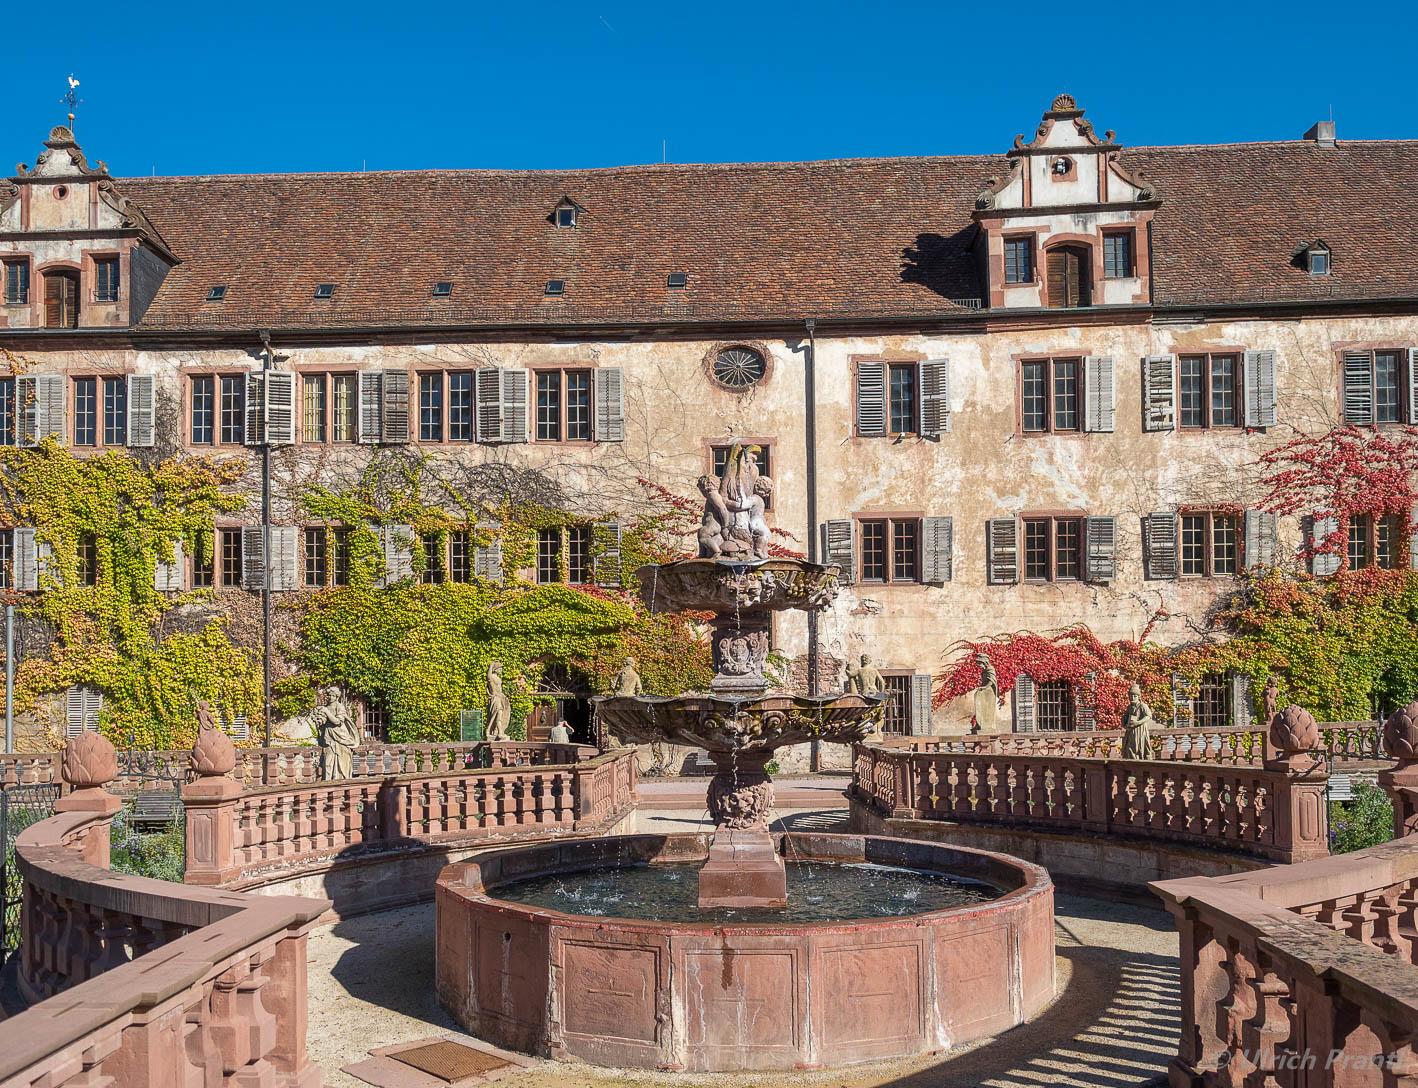 Bronnbach Barockgarten